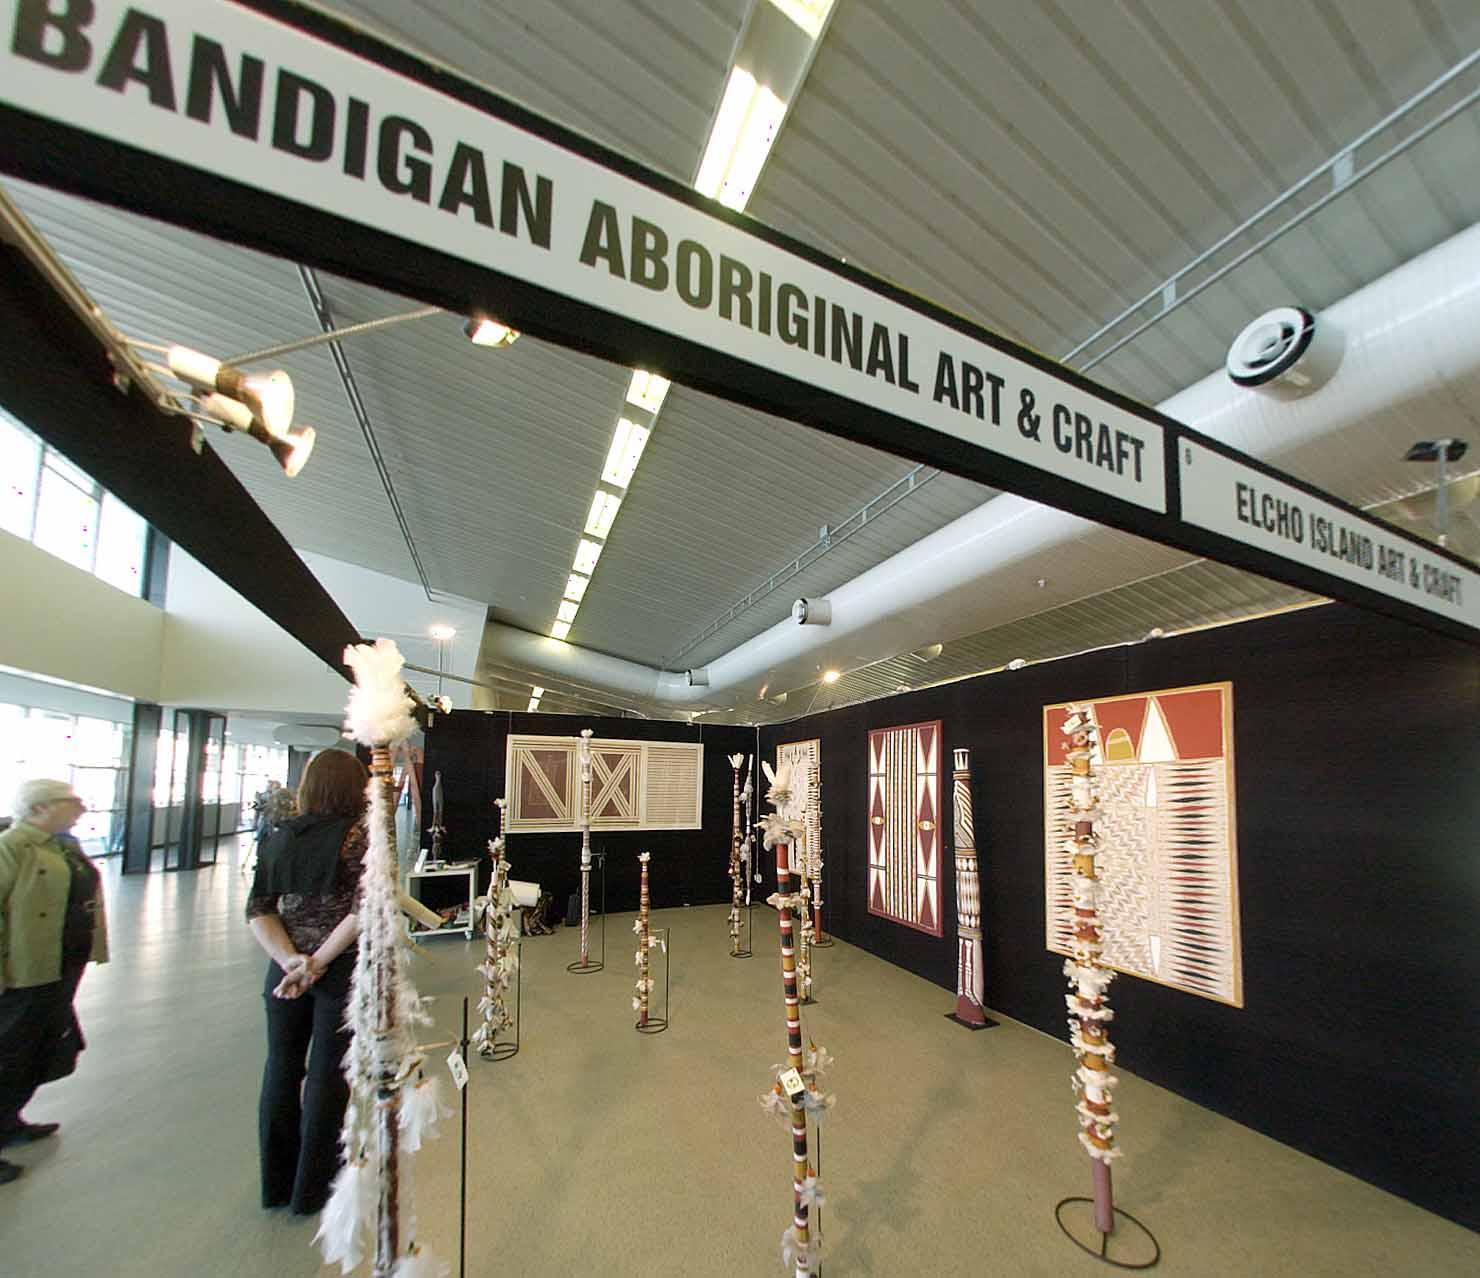 Bandigan Aboriginal Art & Crafts. 19.jpg